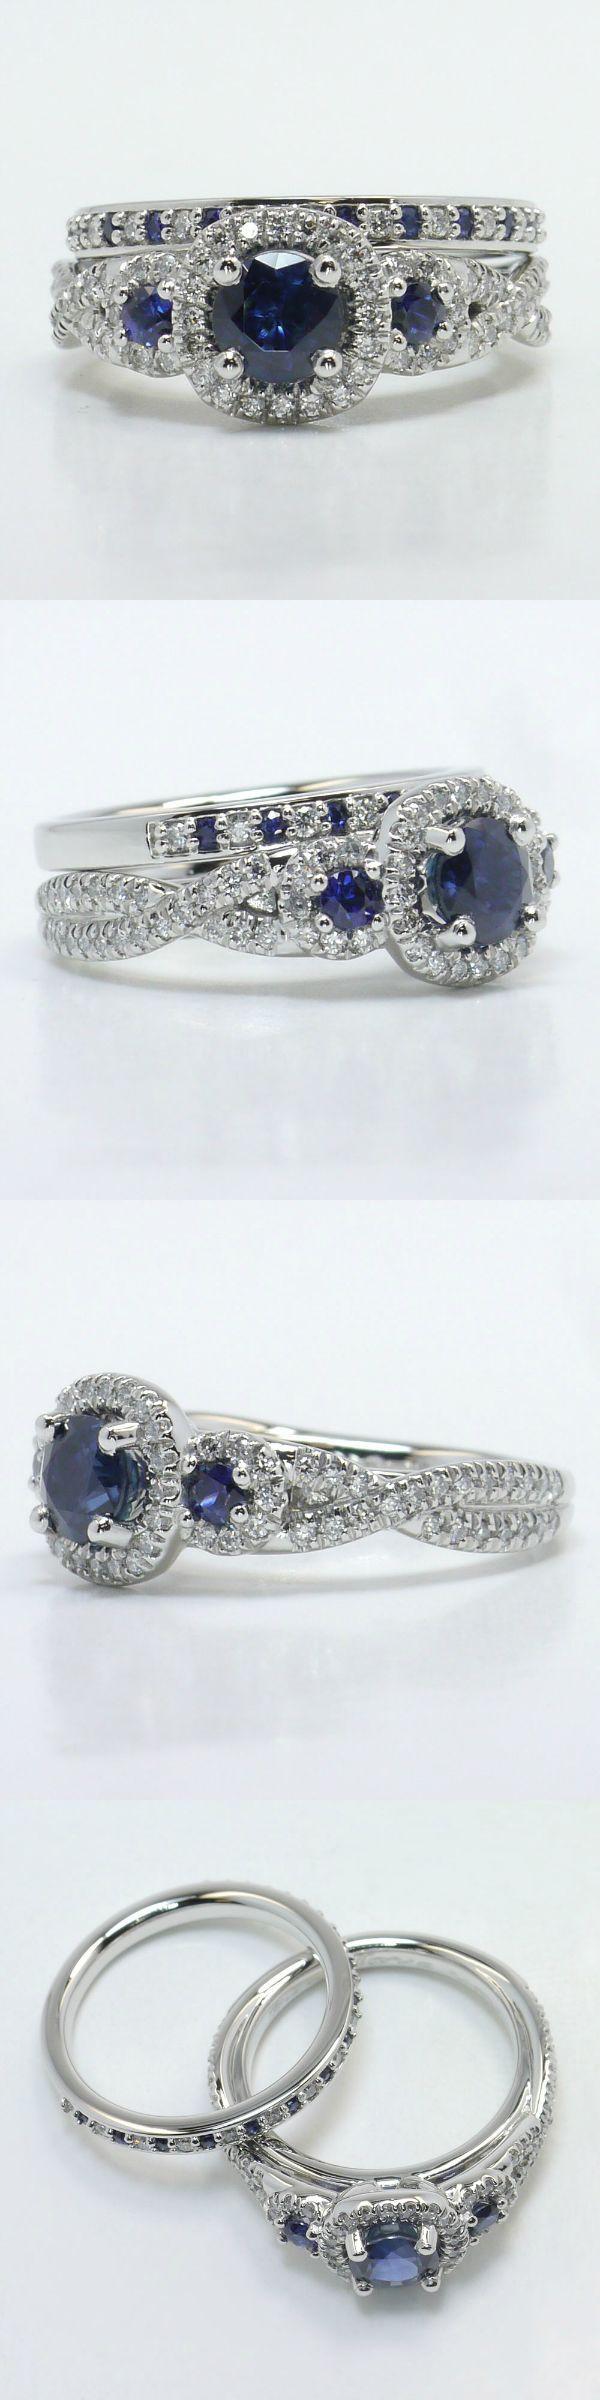 Diamond and Sapphire Gemstone Bridal Set! Round 1 Ctw. Color: Blue Sapphire Diamond/Gem Cost: $1,475 Custom Diamond and Gemstone Bridal Set Metal: 950 Platinum Side Shape: Round Side Carat: .82 Side Color: G-H Side Clarity: VS2 Side Cut: Ideal Setting Cost: $3,895 Total Cost: $5,370 www.brilliance.com